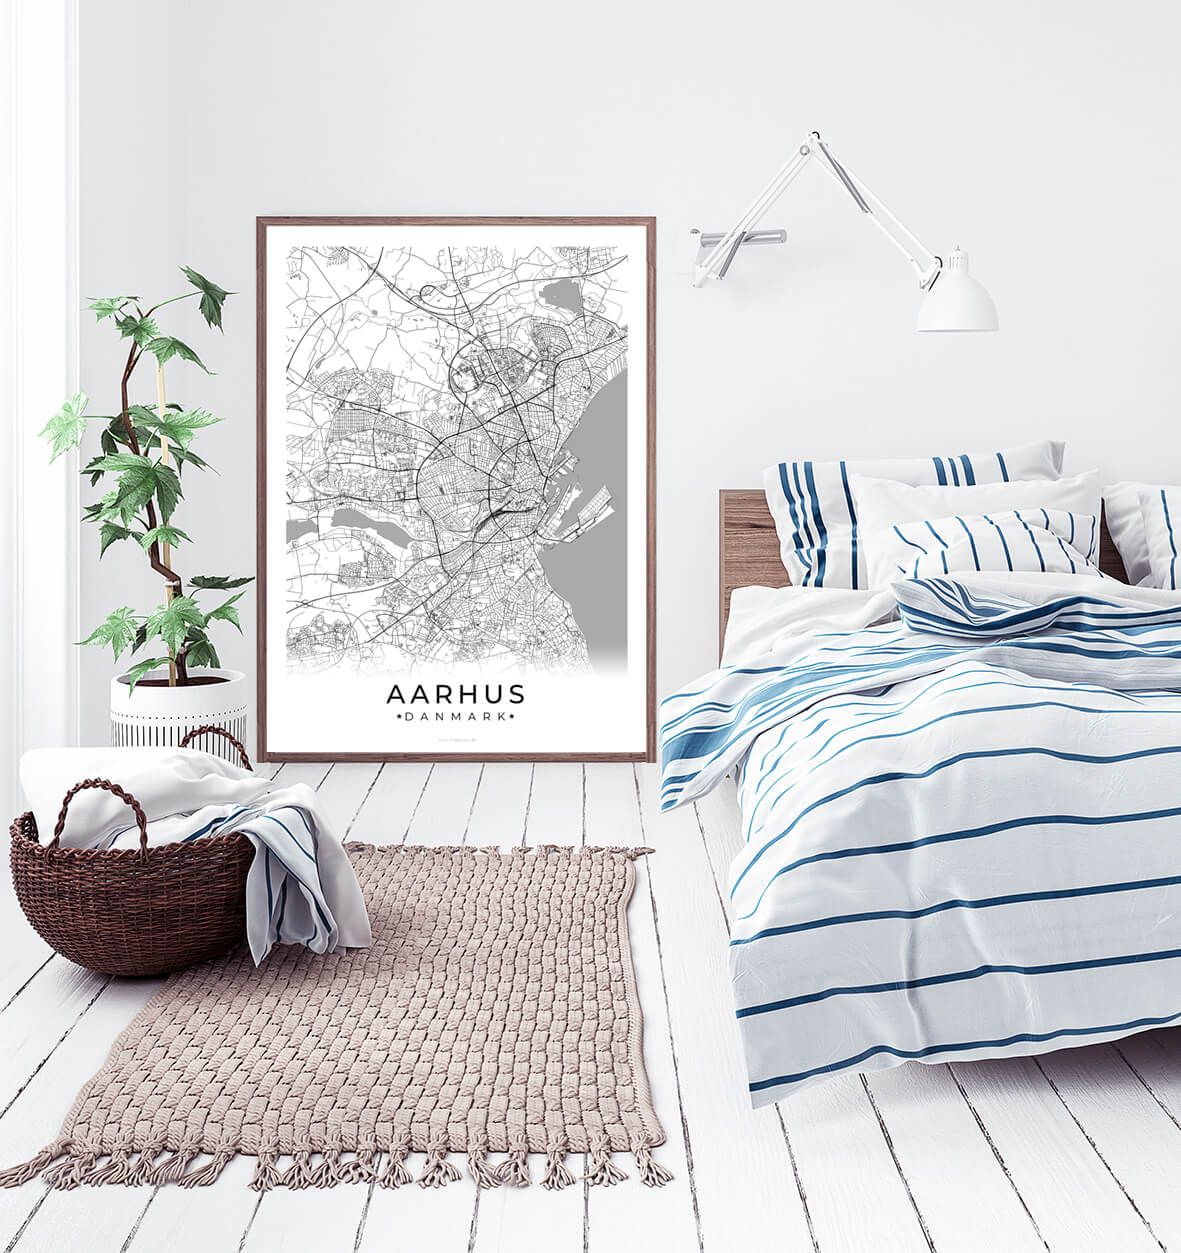 Aarhus-hvid-byplakat-2